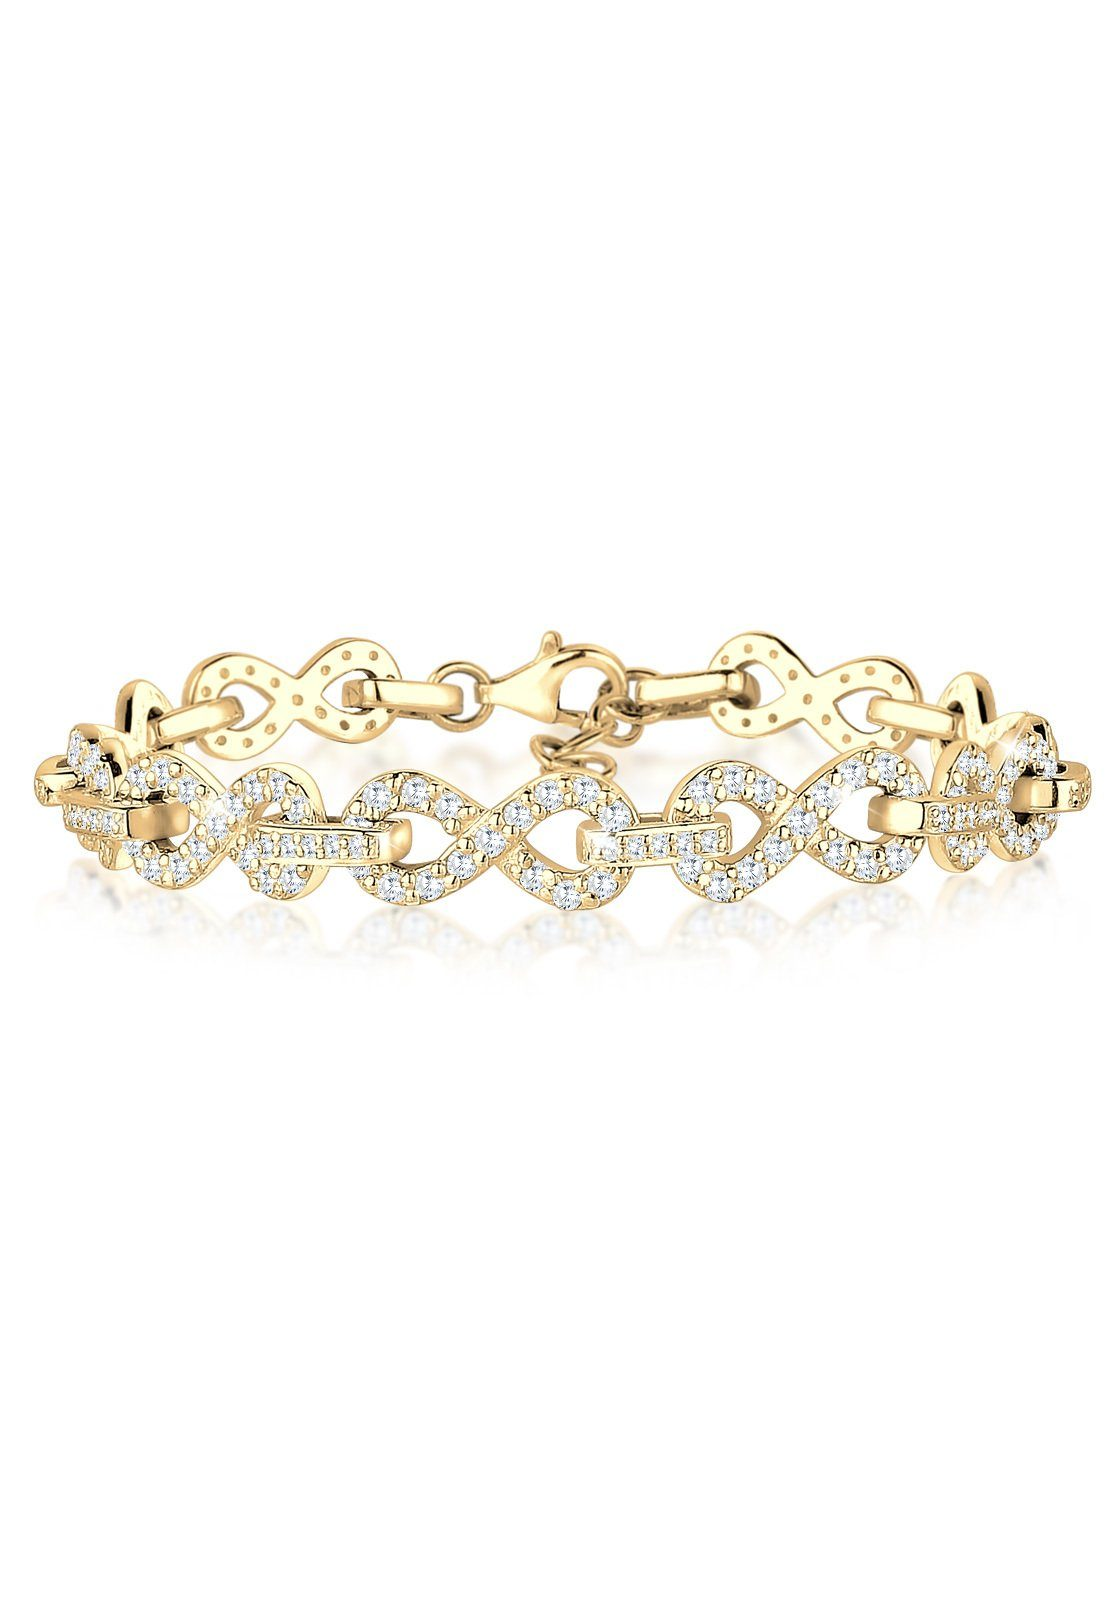 Elli Armband Infinity Zirkonia 925 Silber | Schmuck > Armbänder | Elli